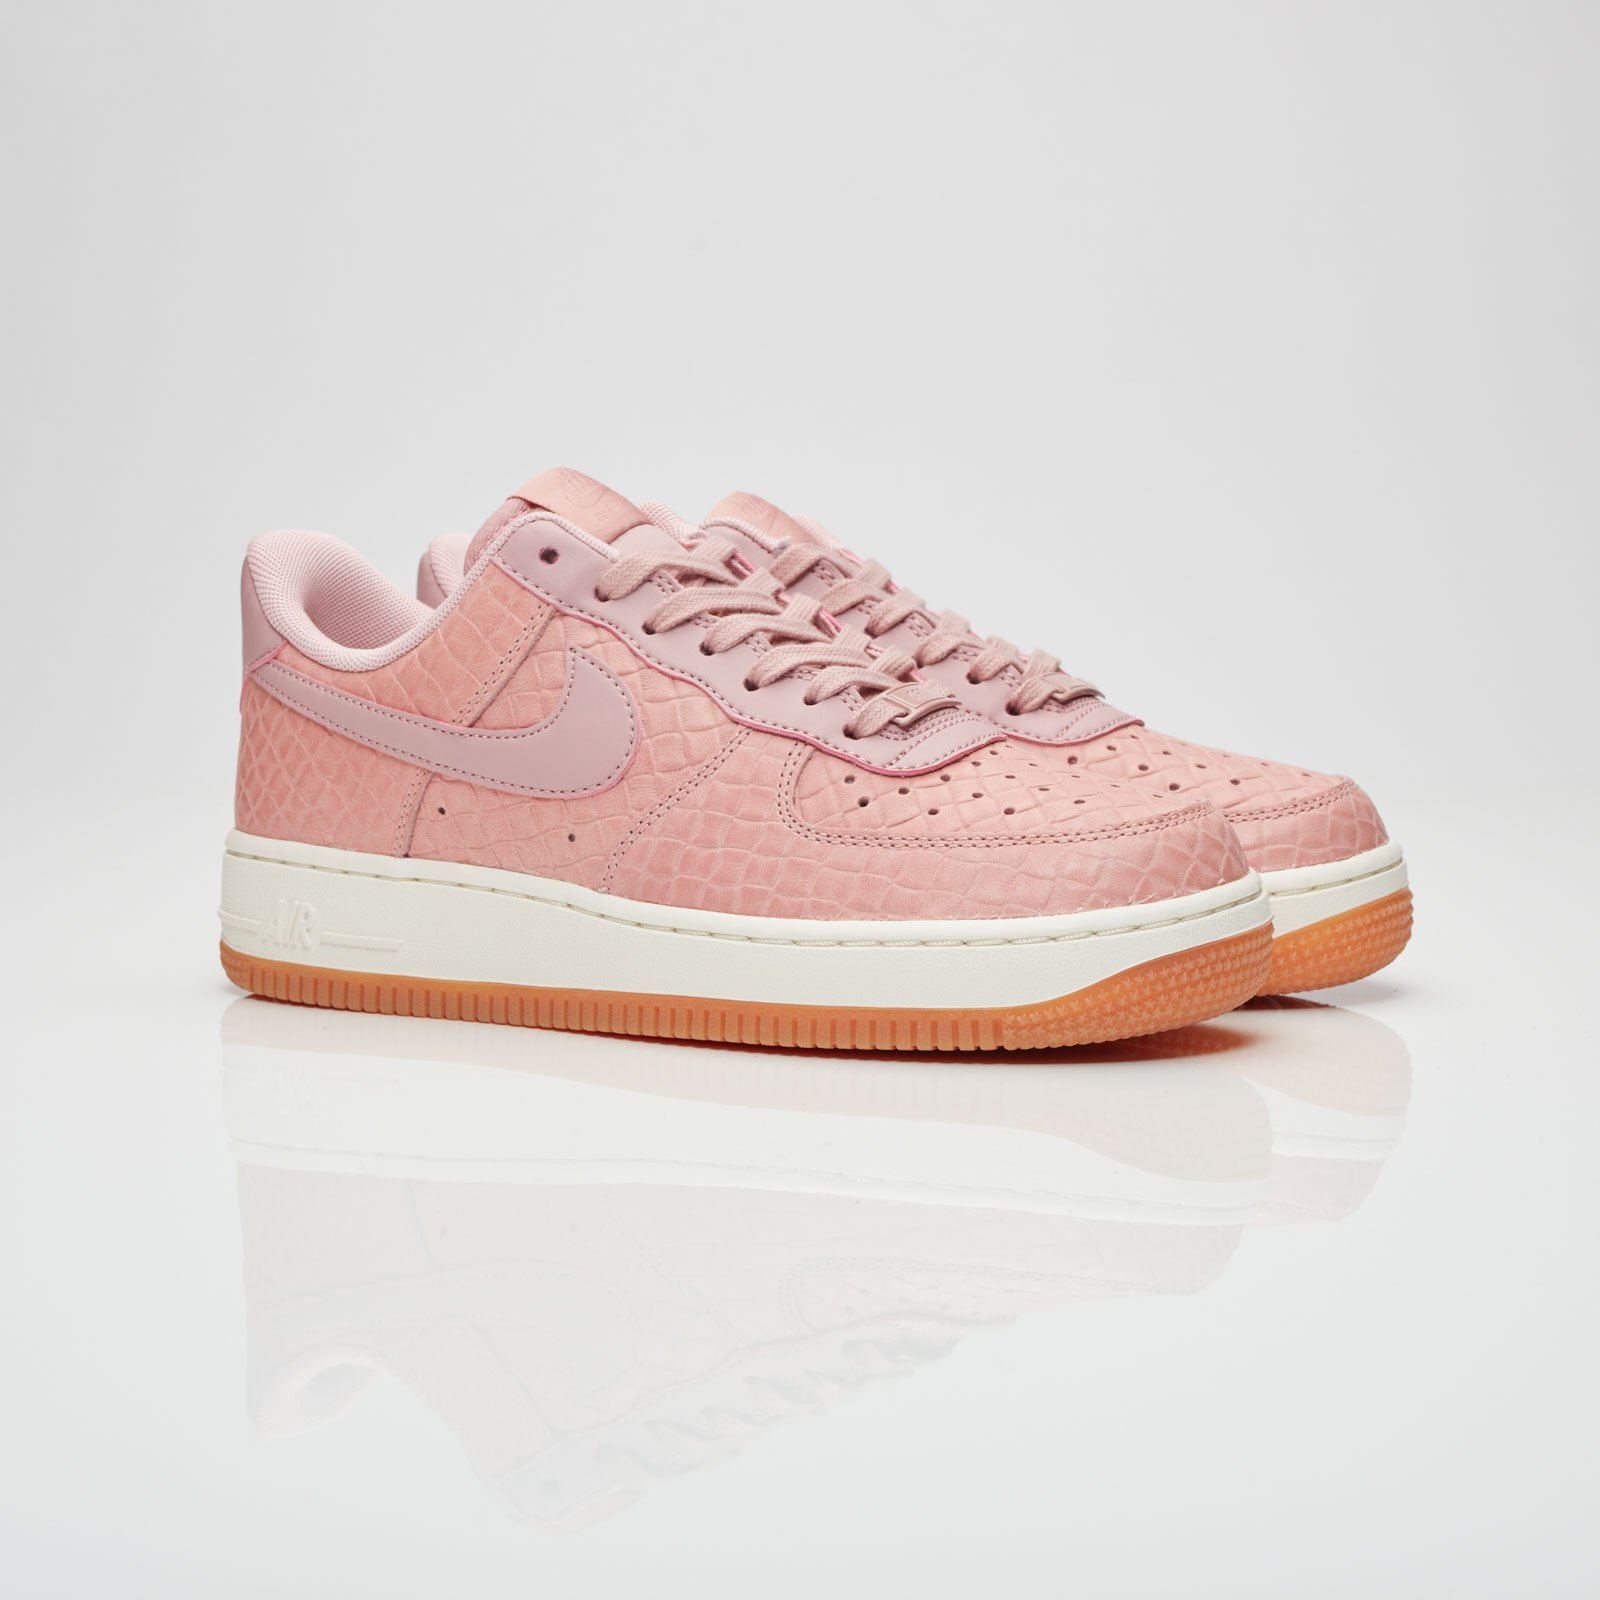 Nike 1 Wmns Air Force 1 Nike 07 Premium Zapatillasnstuff 616725 601 58e64f